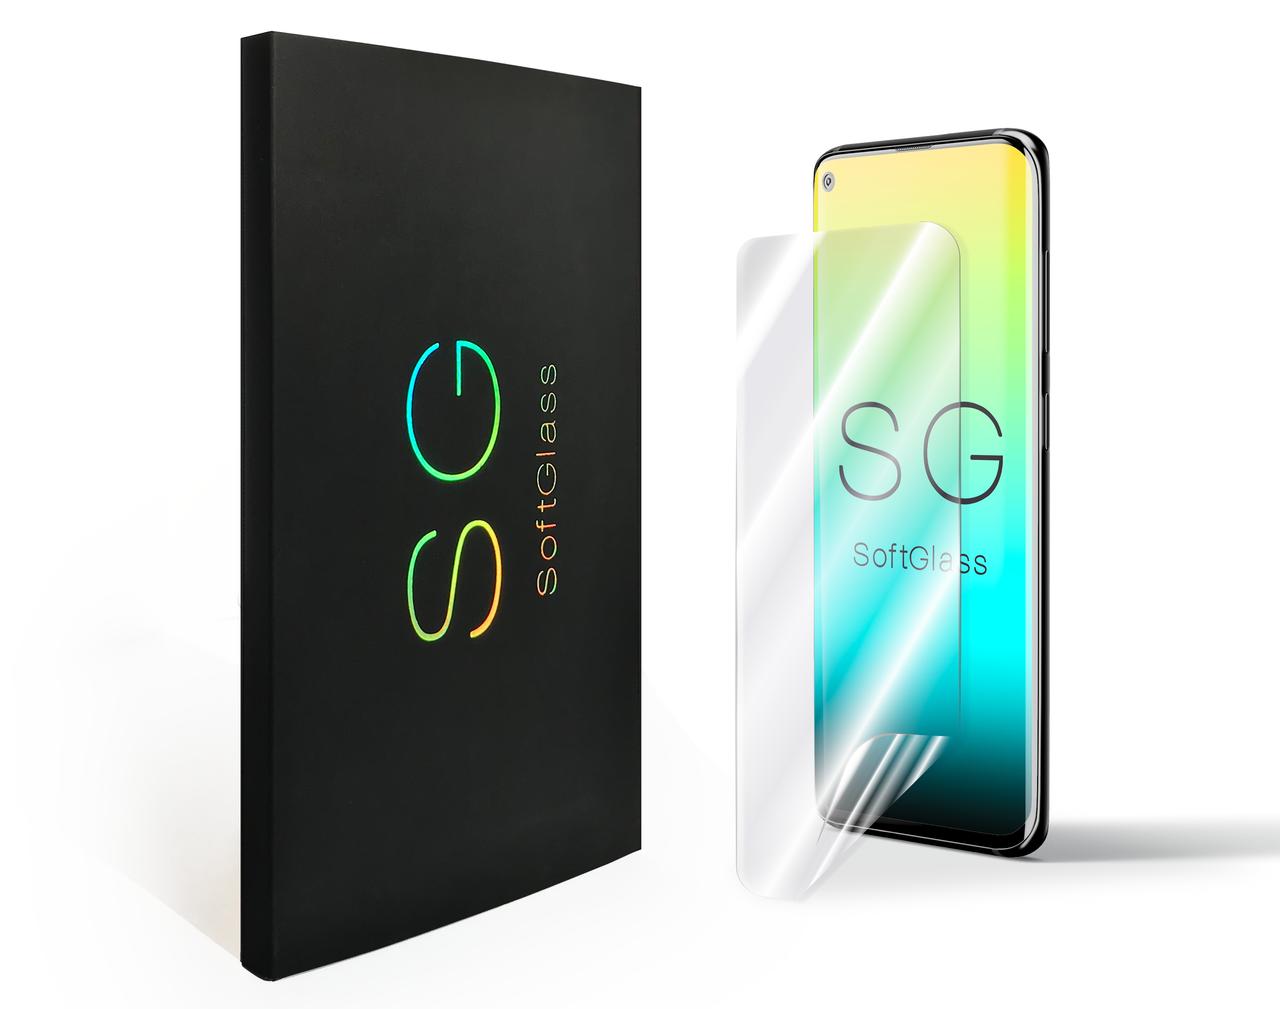 Мягкое стекло Samsung G355 SoftGlass Экран